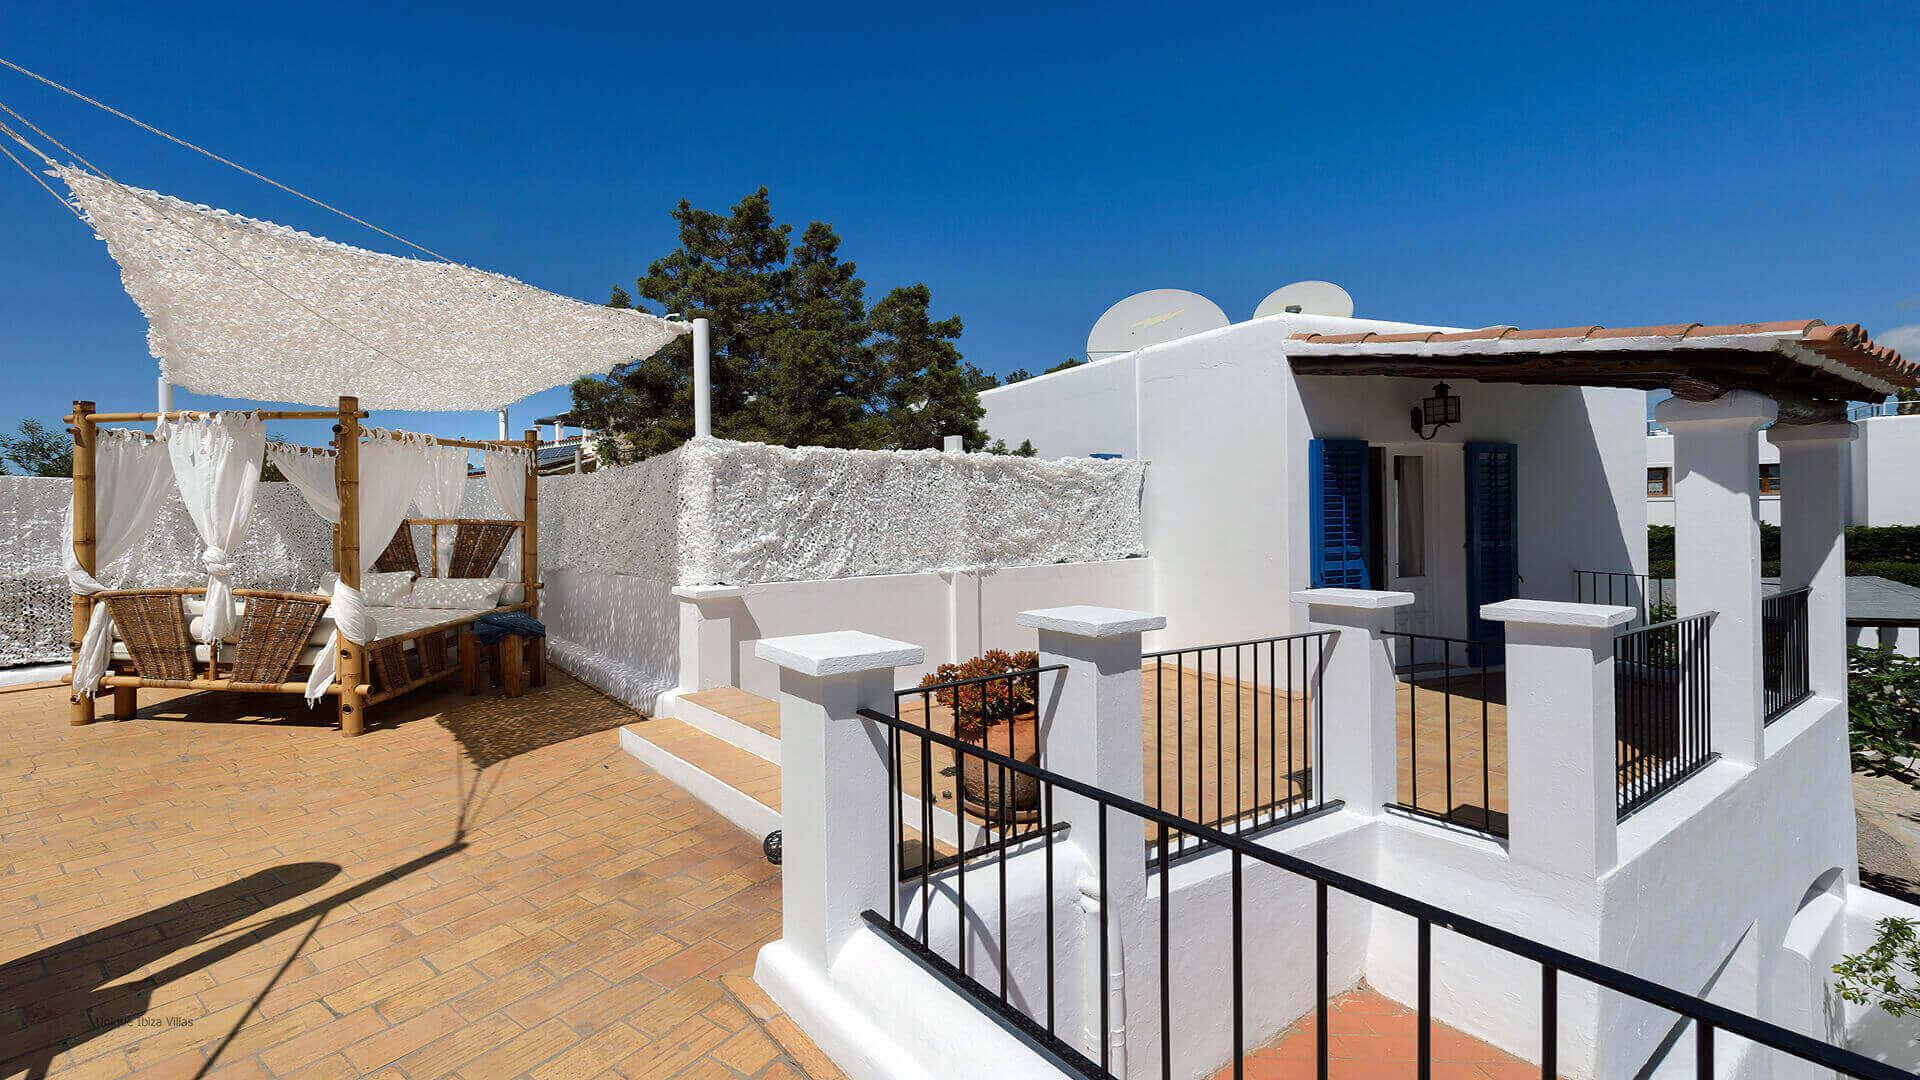 Villa Cigala Ibiza 23 Bungalow Terrace